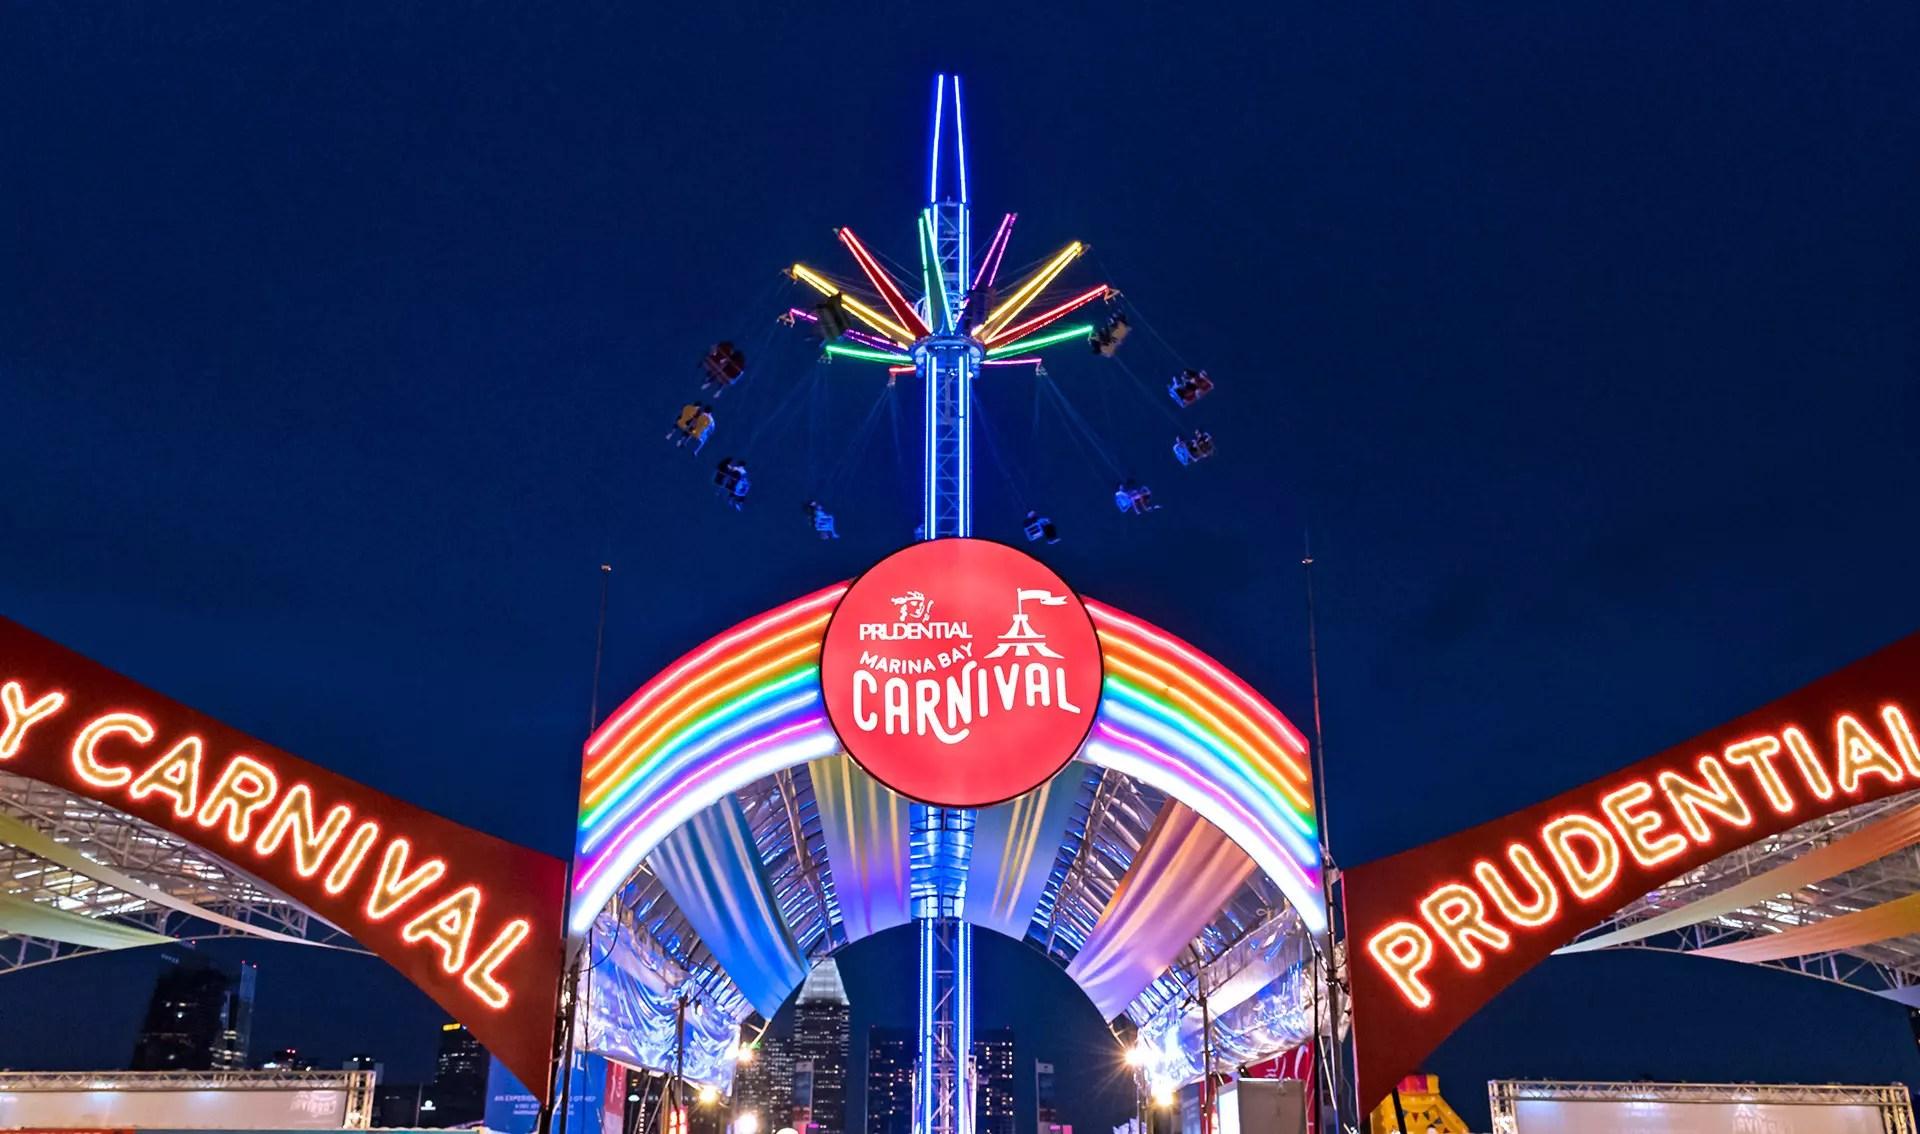 Prudential Marina Bay Carnival 2017